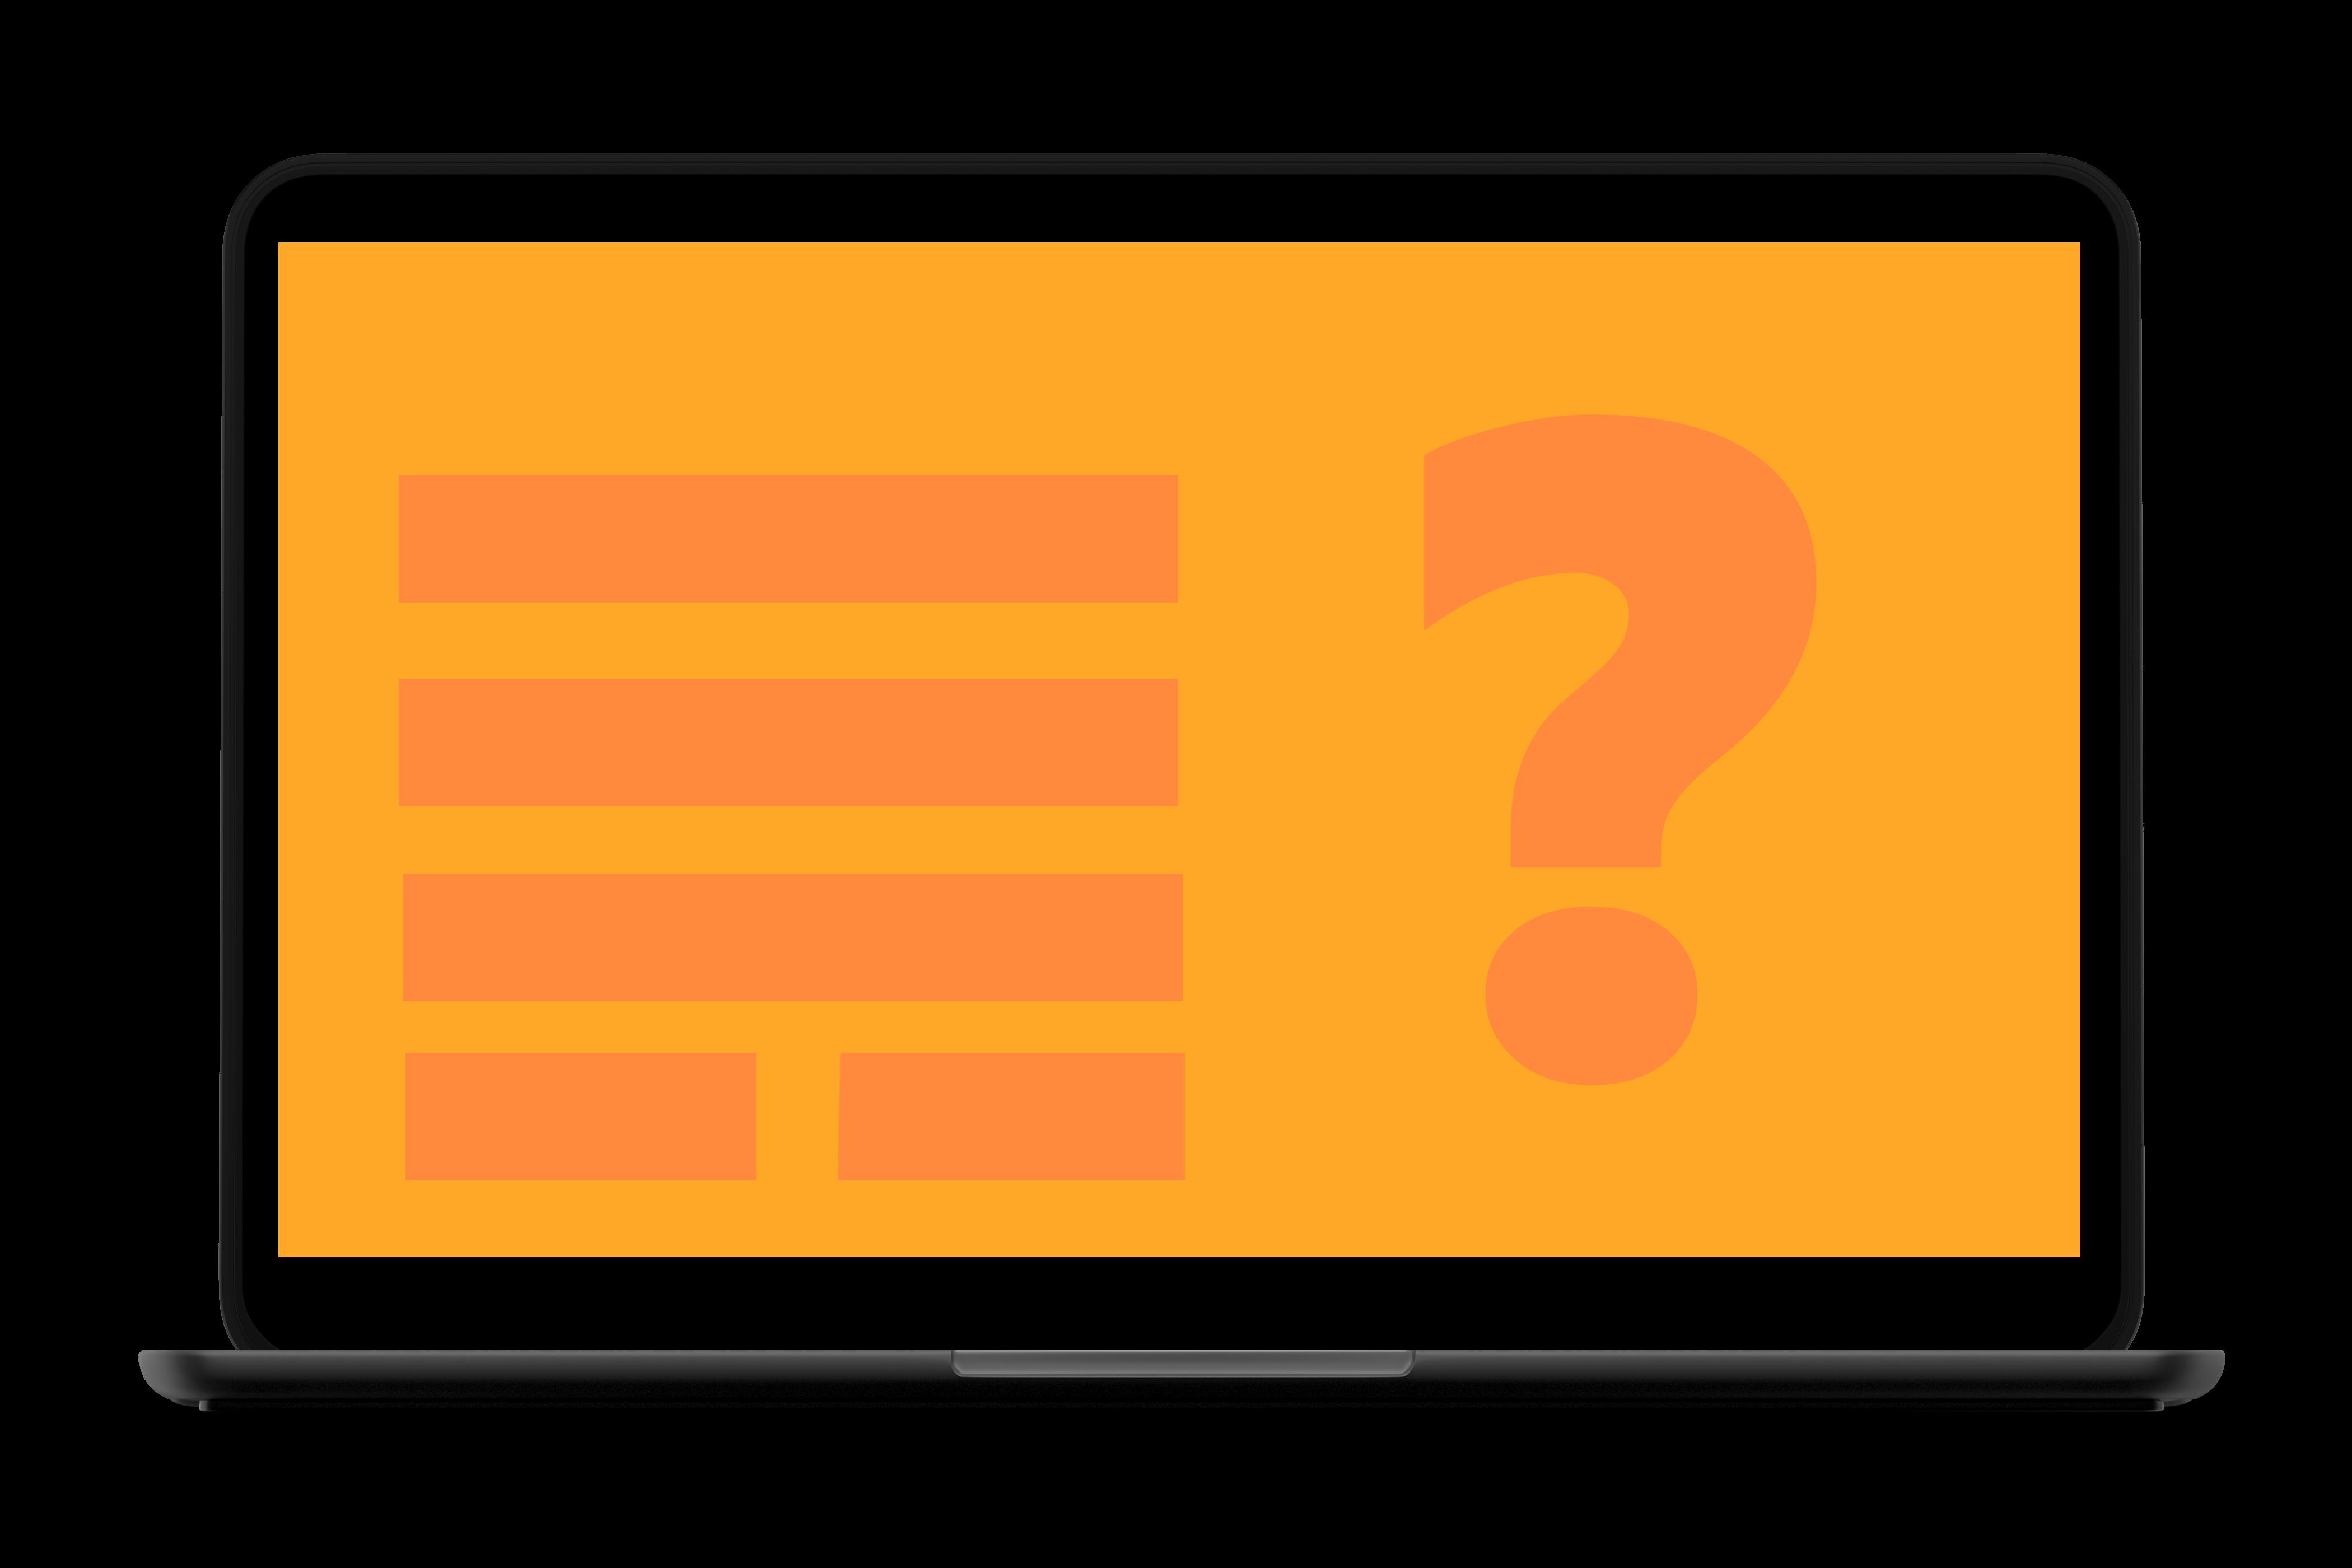 webové stránky tooltip - tvorba webových stránek